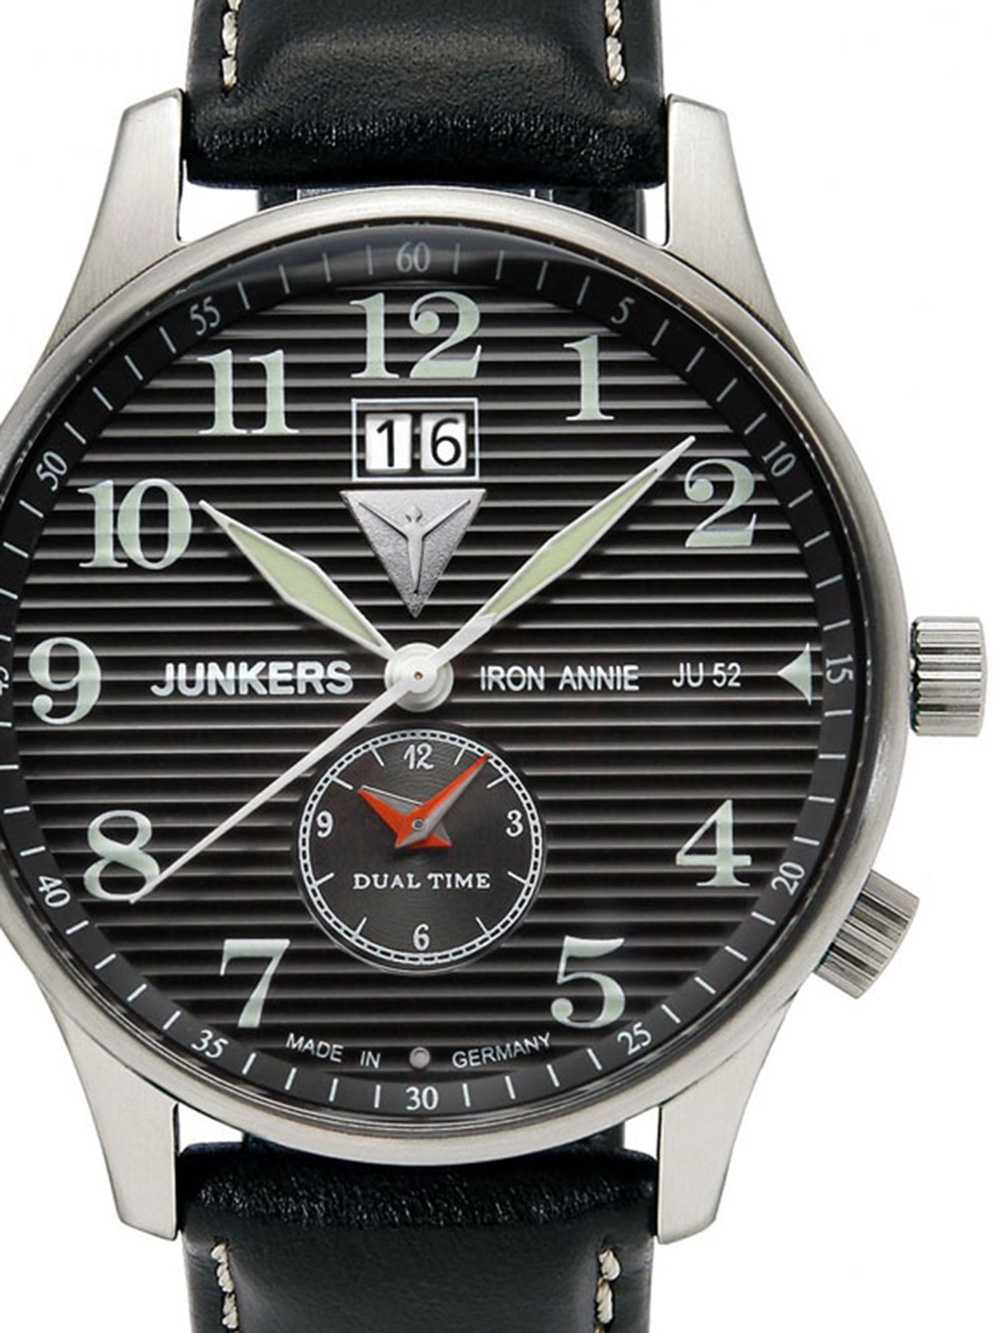 Junkers Lufthansa Ju 52 6640 2 Dual Time Herrenuhr